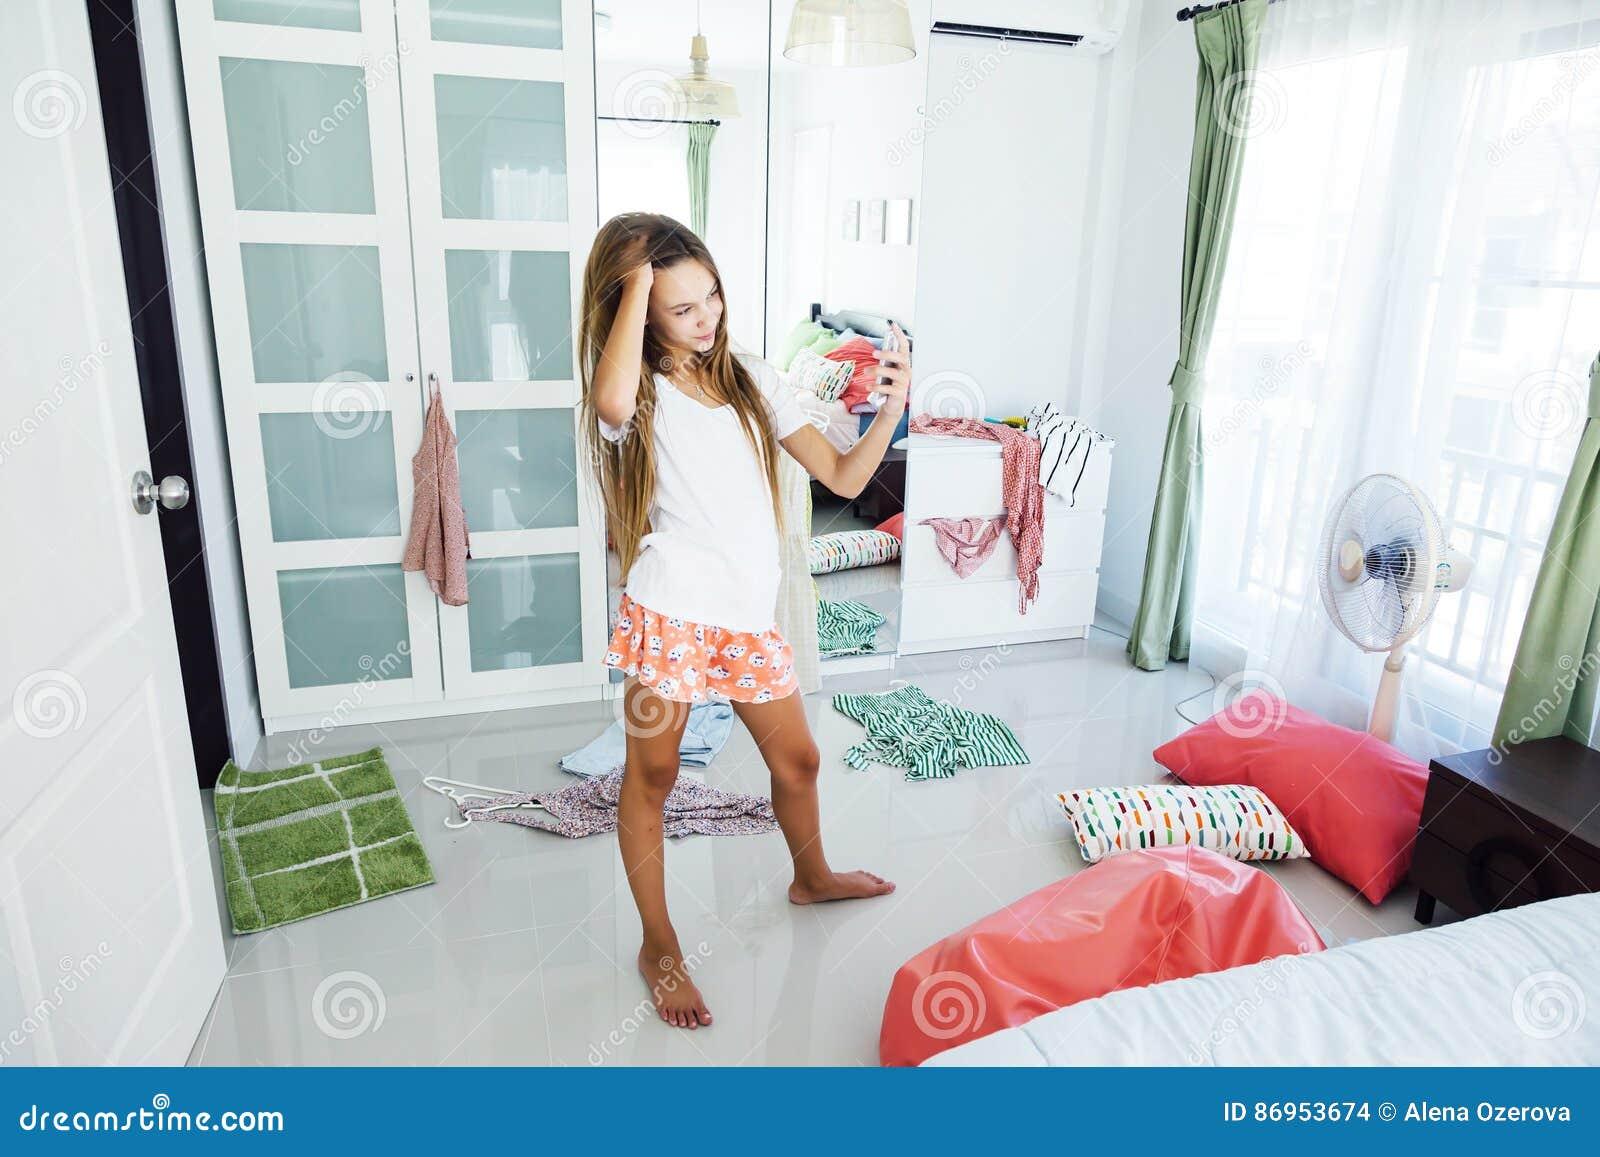 Teenage girl choosing clothing in closet